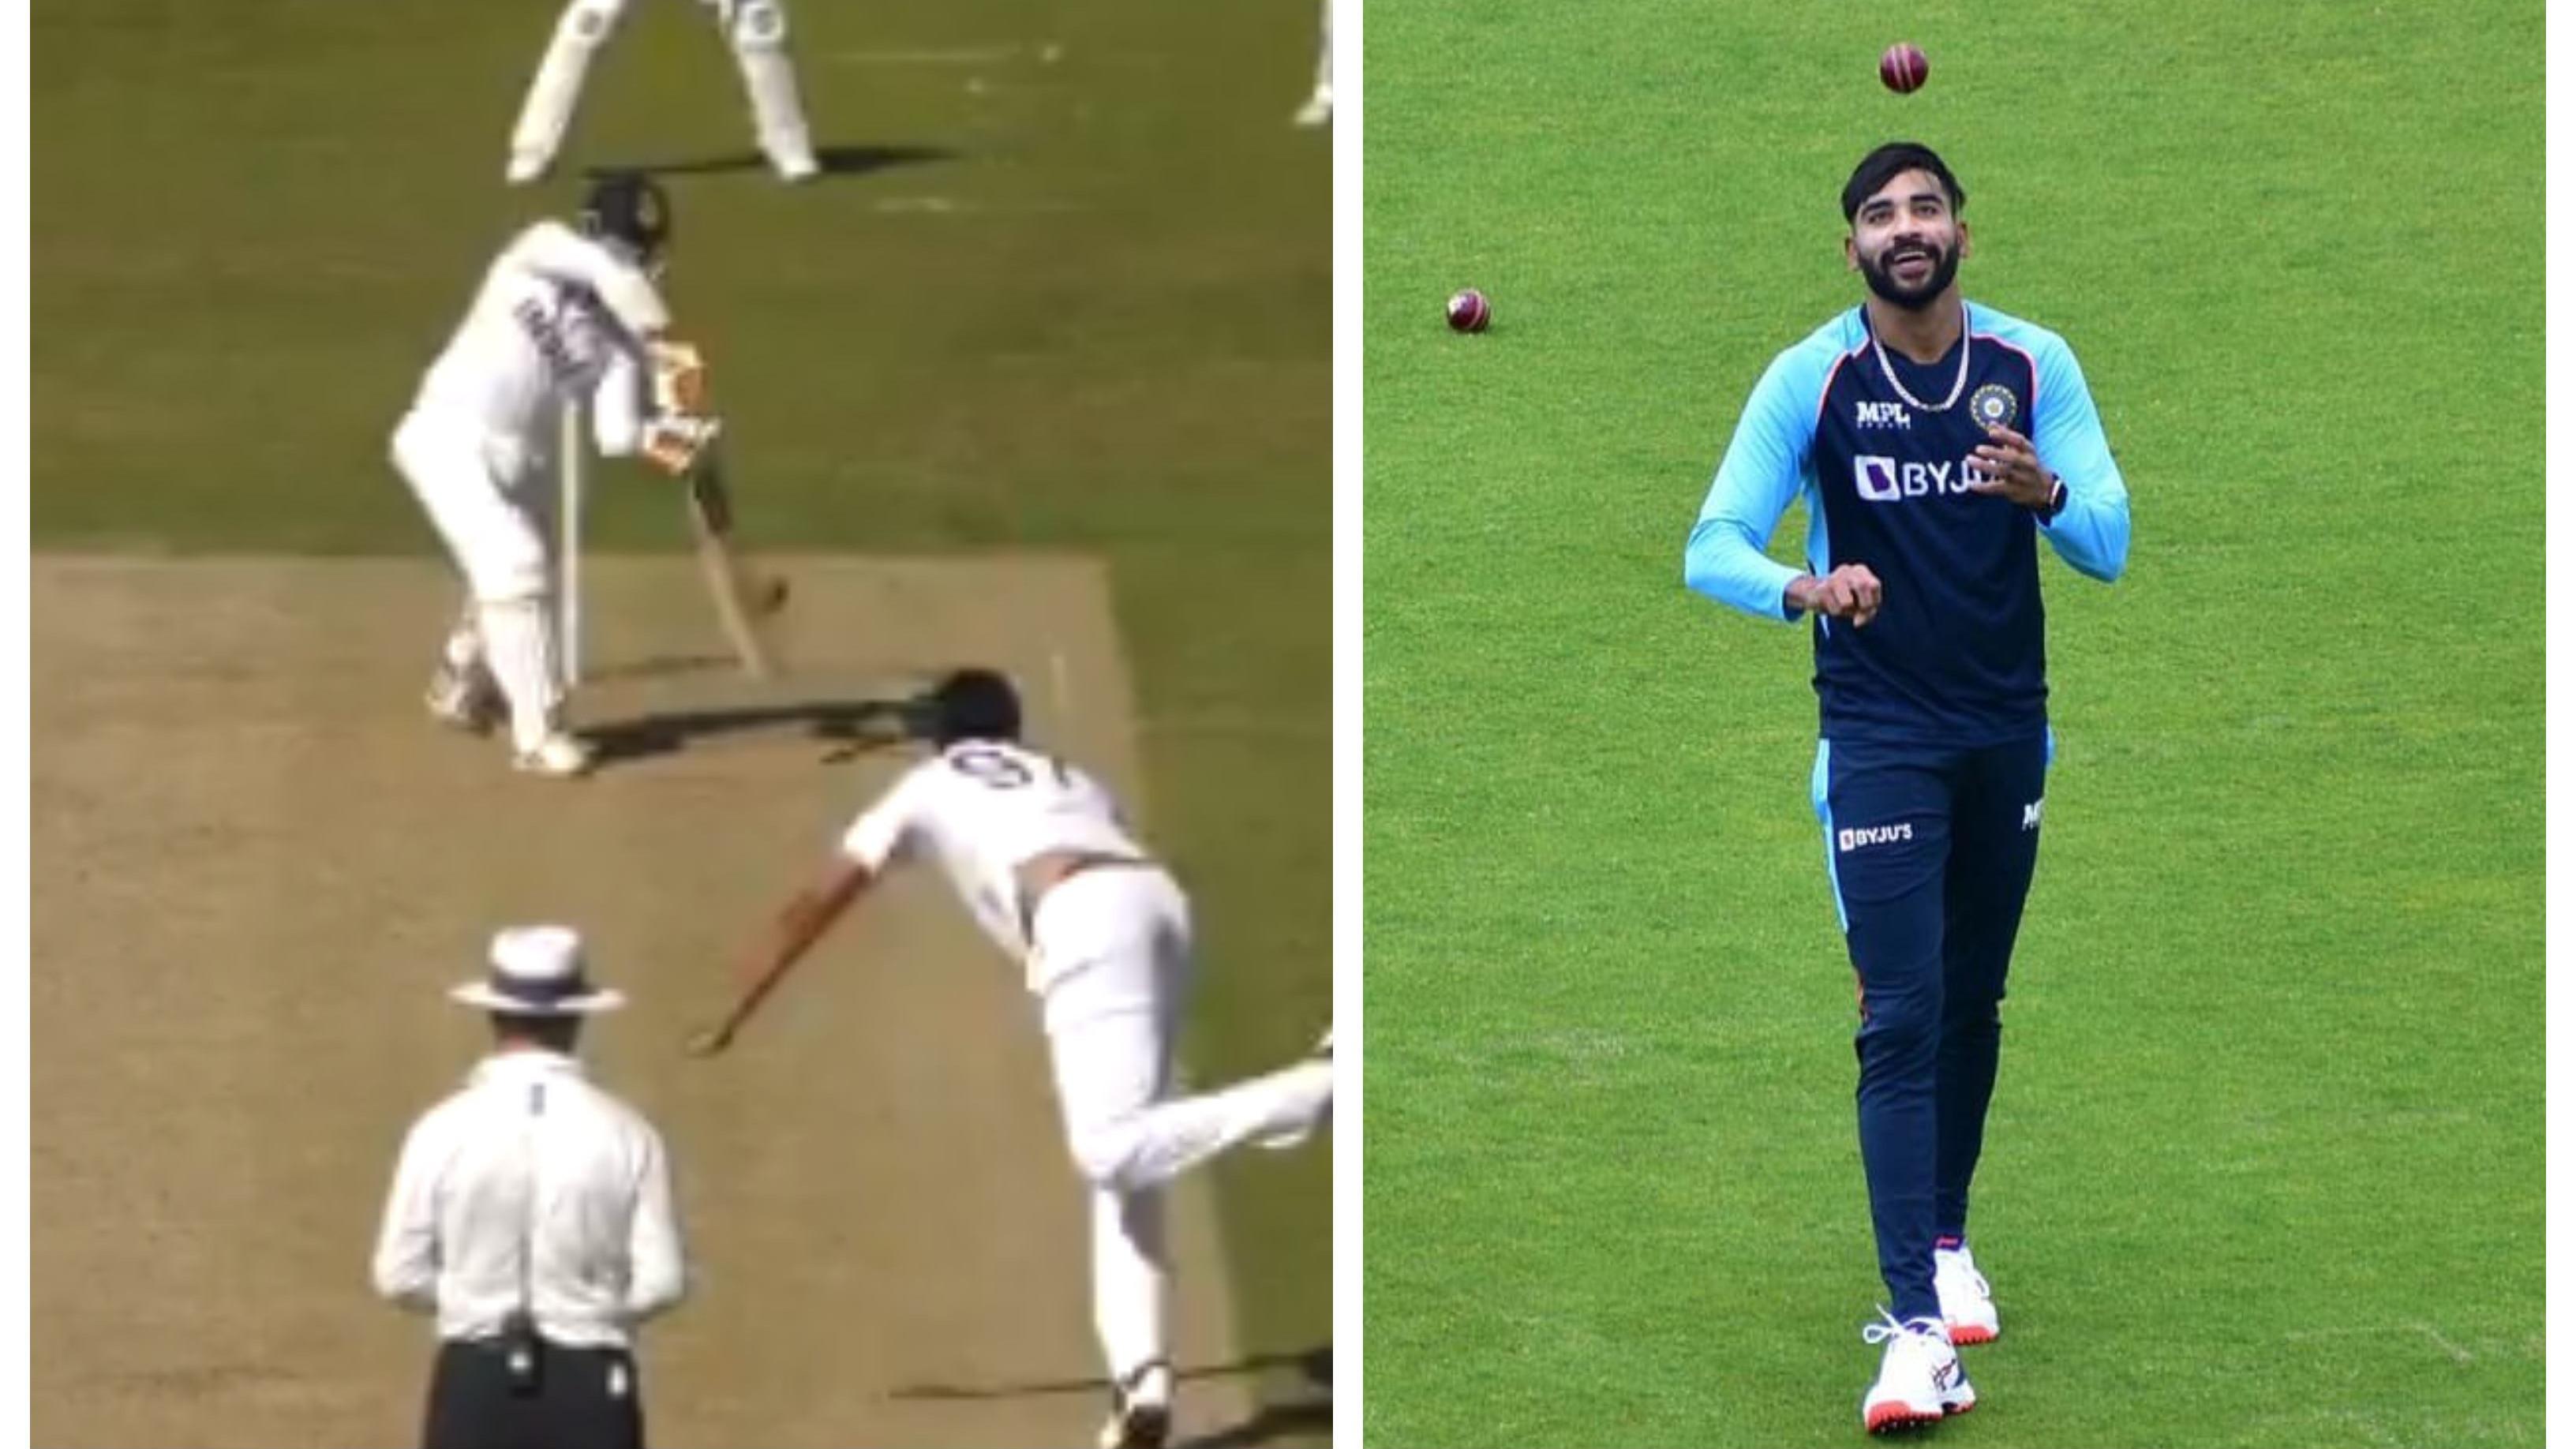 WTC 2021 Final: WATCH – Jadeja slams half-century, Siraj claims two wickets in intra-squad match on Day 3